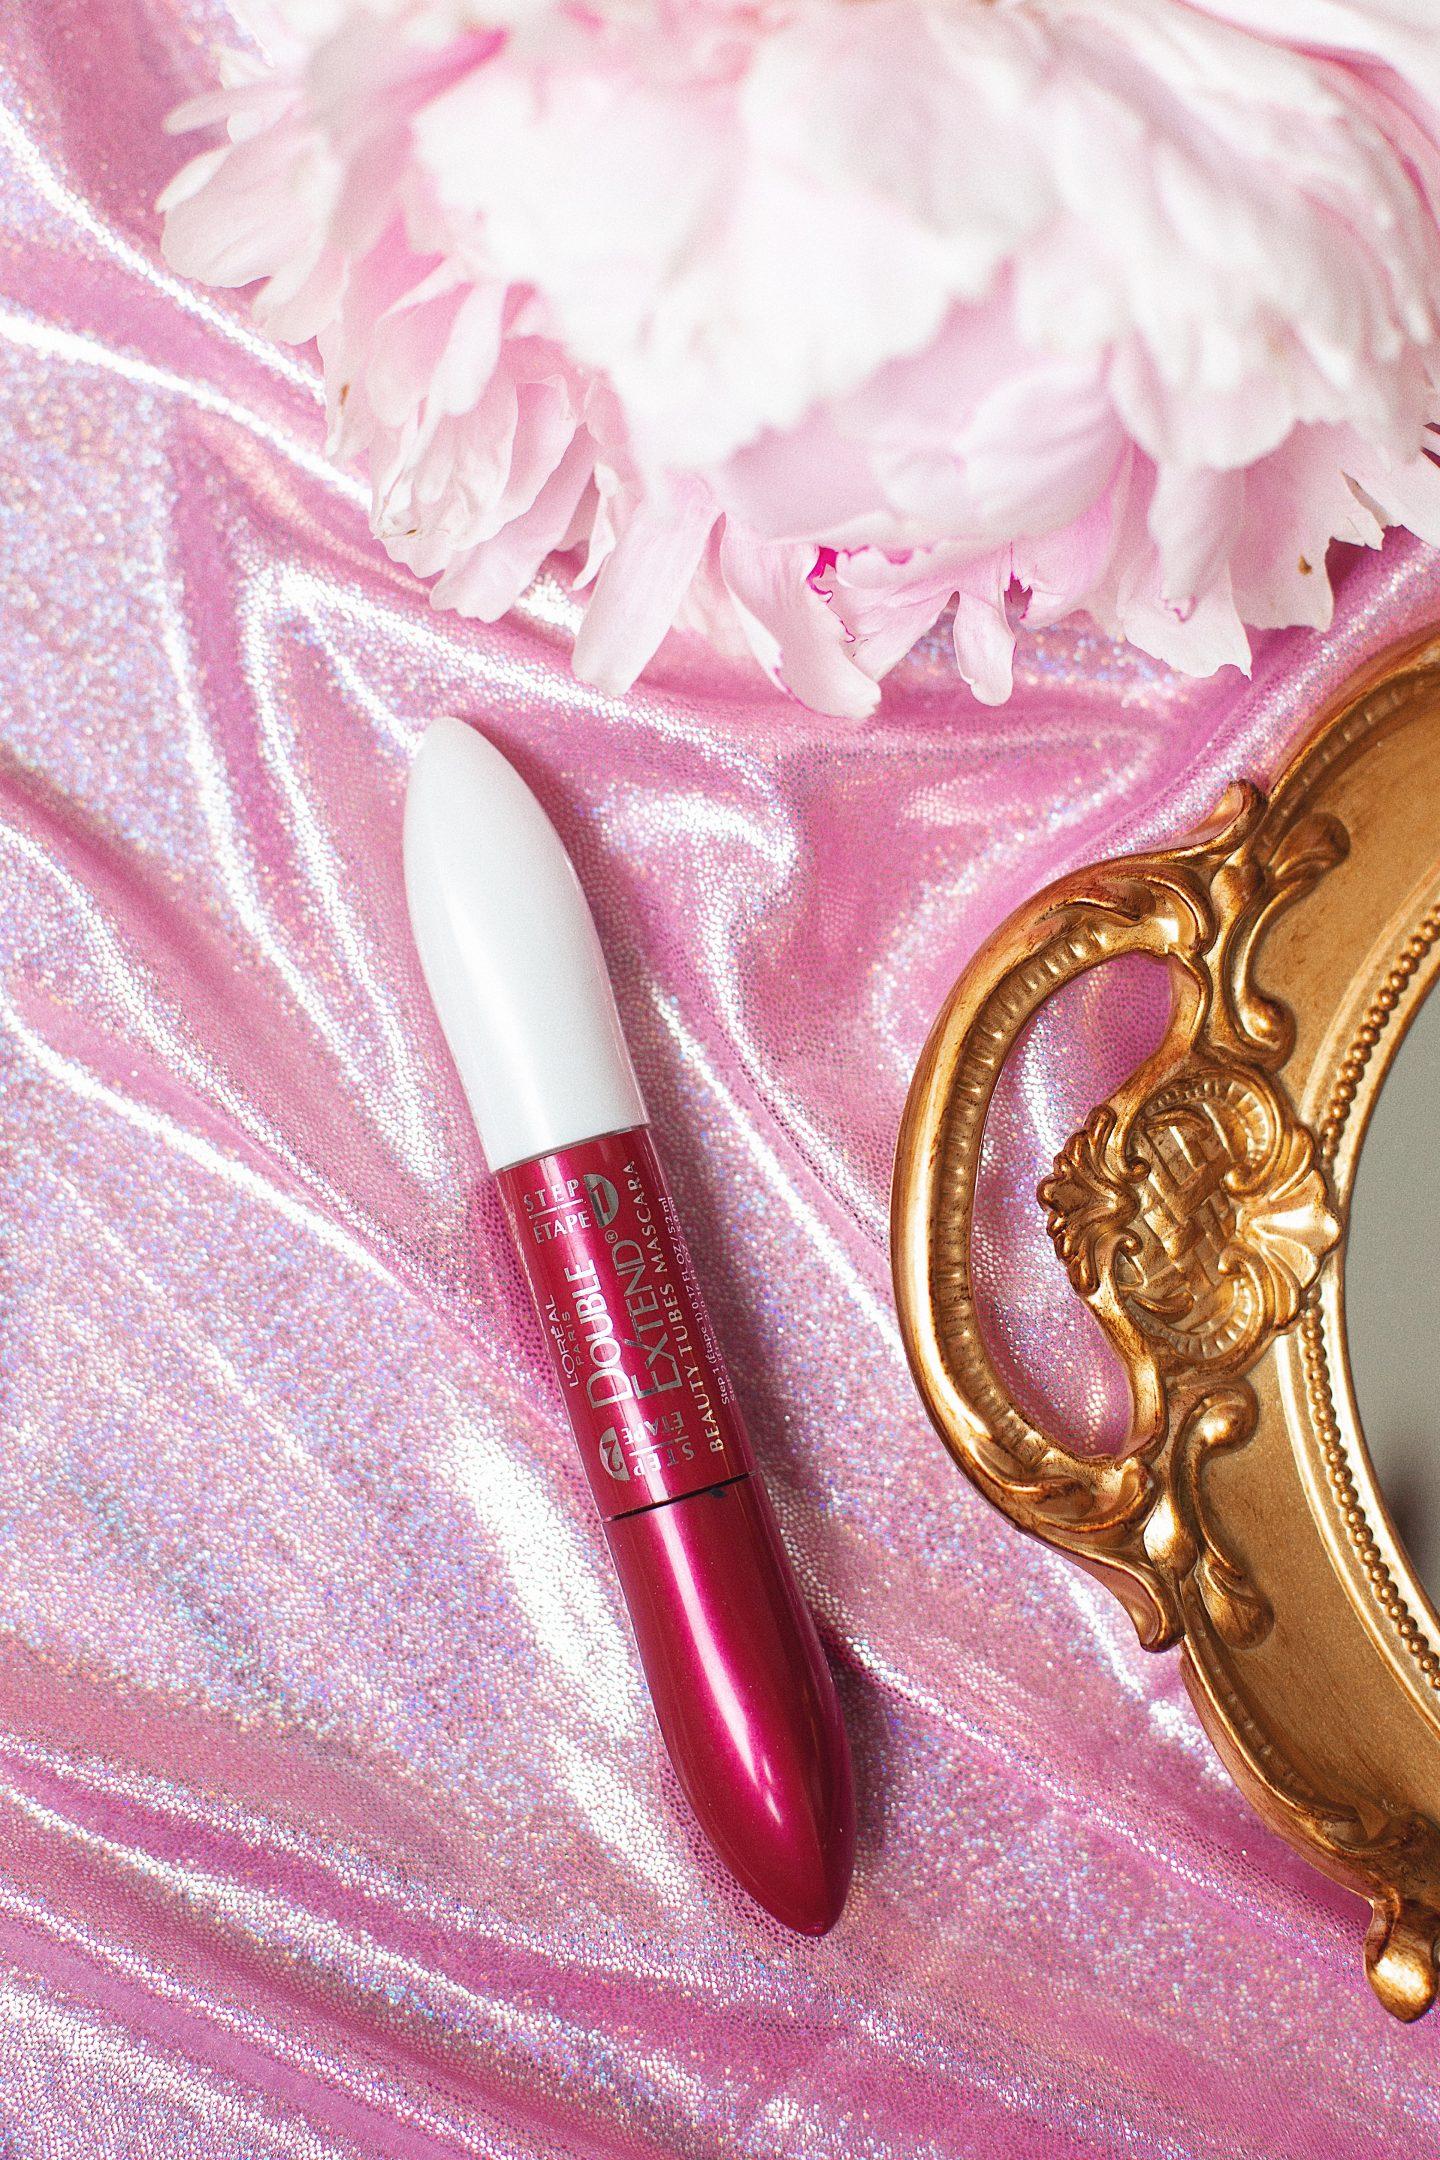 L'Oreal Paris Makeup Double Extend Beauty Tubes Lengthening 2 Step Mascara